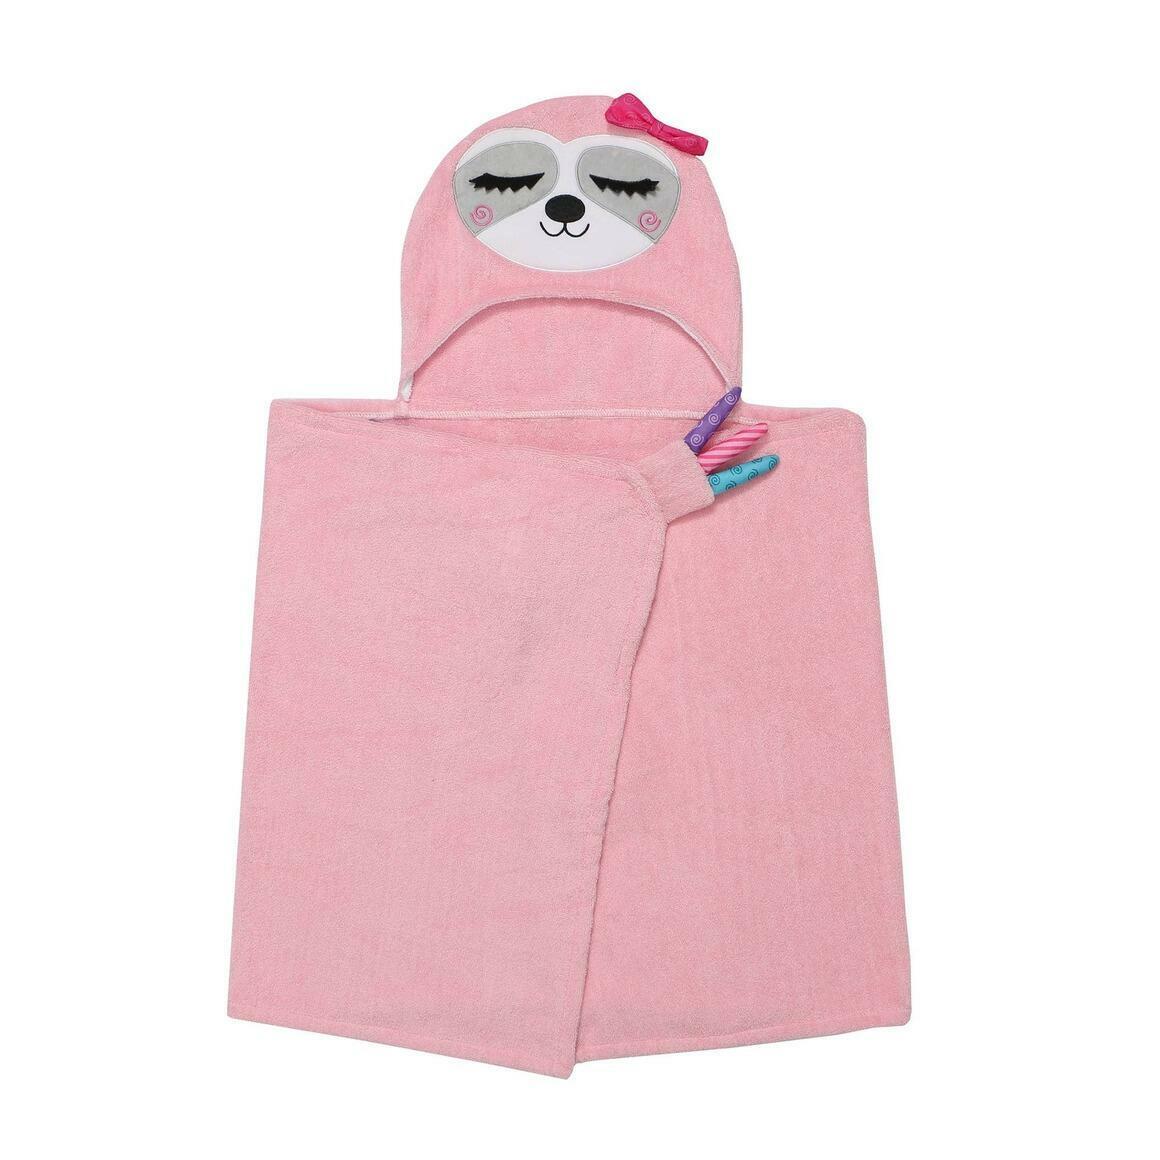 Kids Plus Terry Hooded Bath Towel Sloth 2Y+ | Trada Marketplace